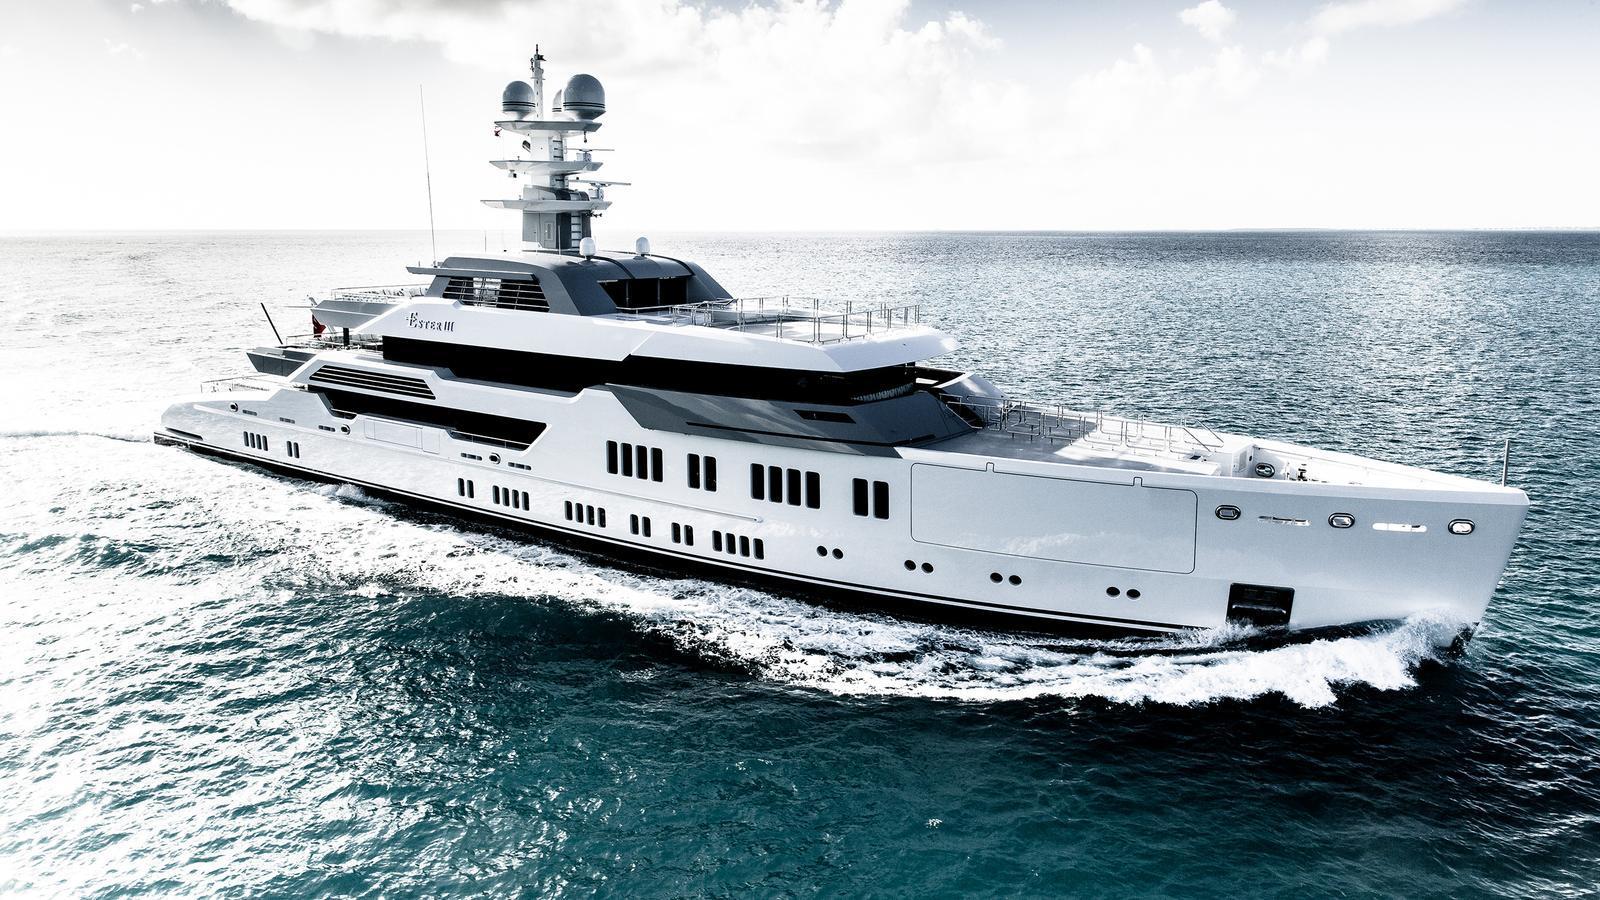 iroquois ester iii motor yacht lurssen 2014 66m cruising